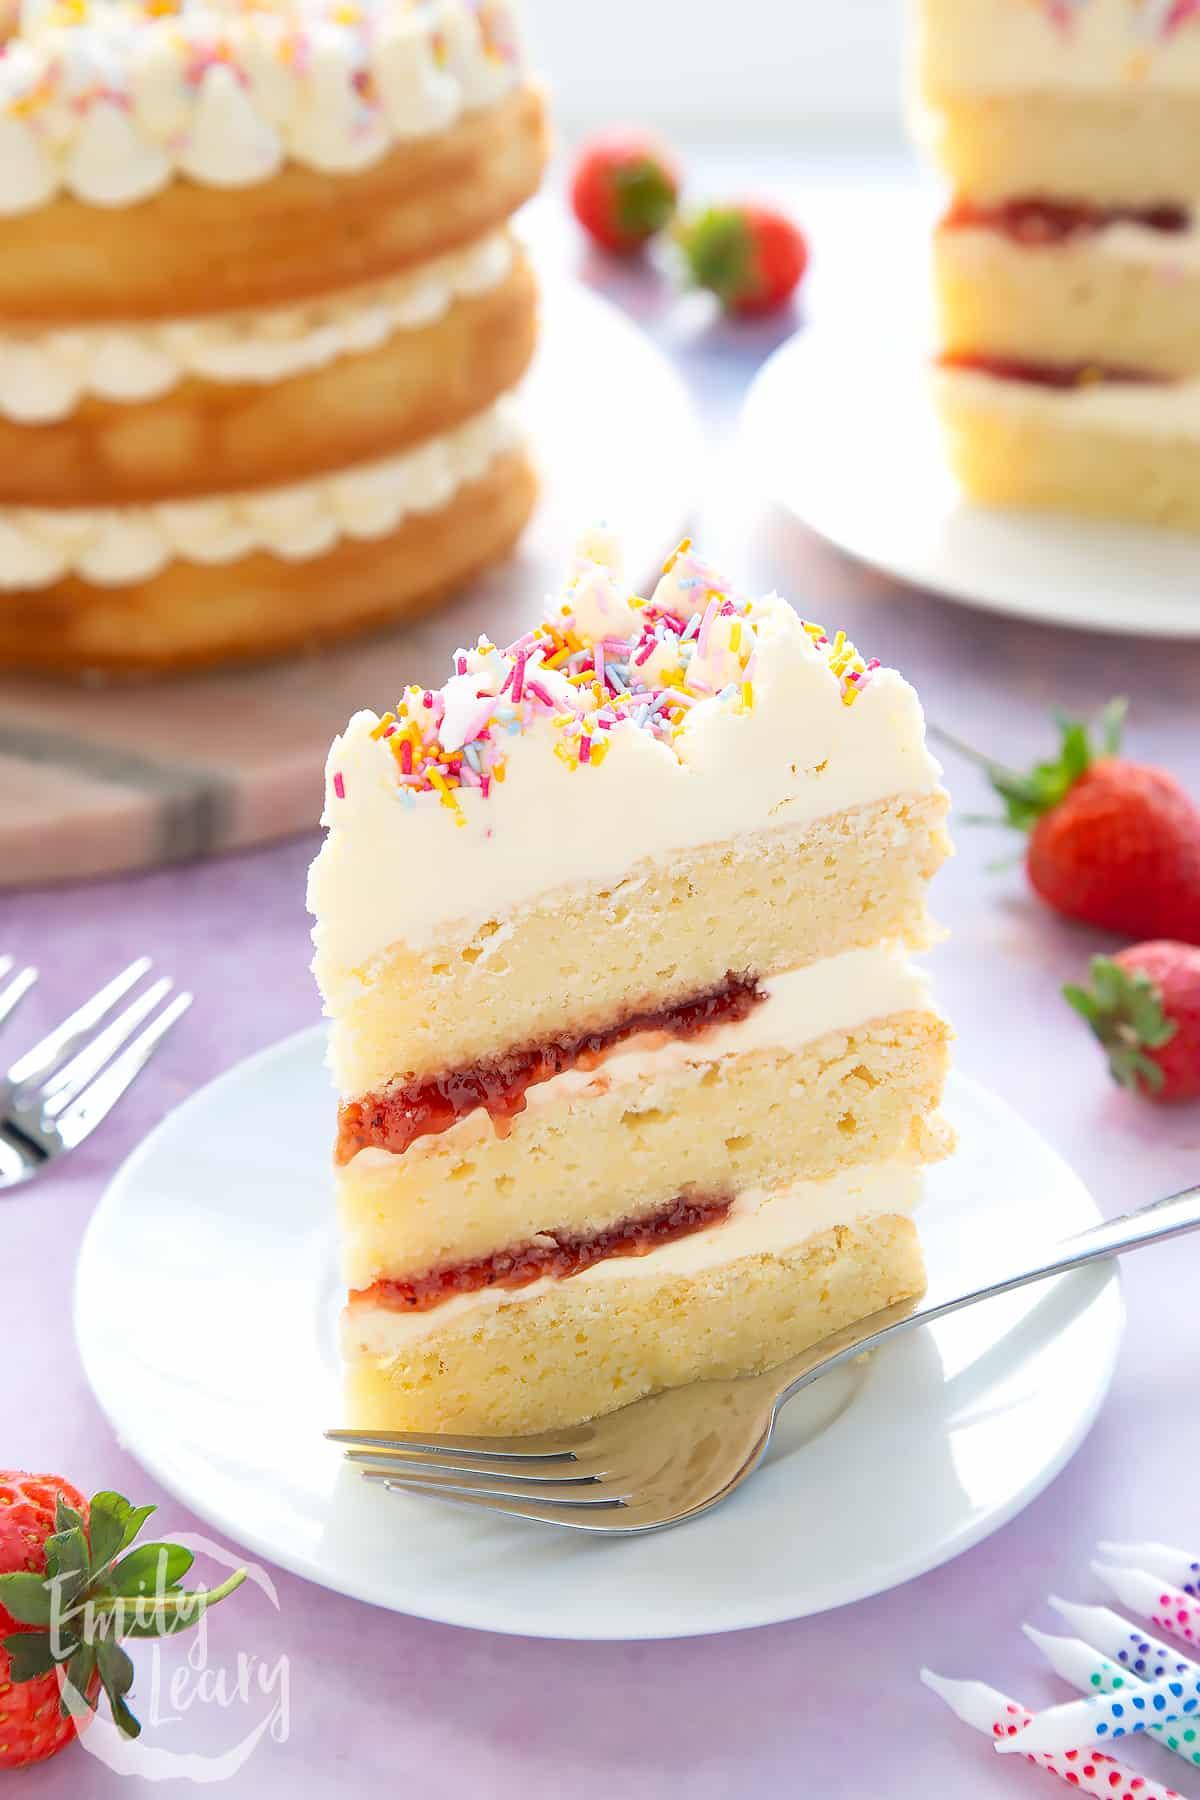 Slice of vegan birthday cake on a small white plate.